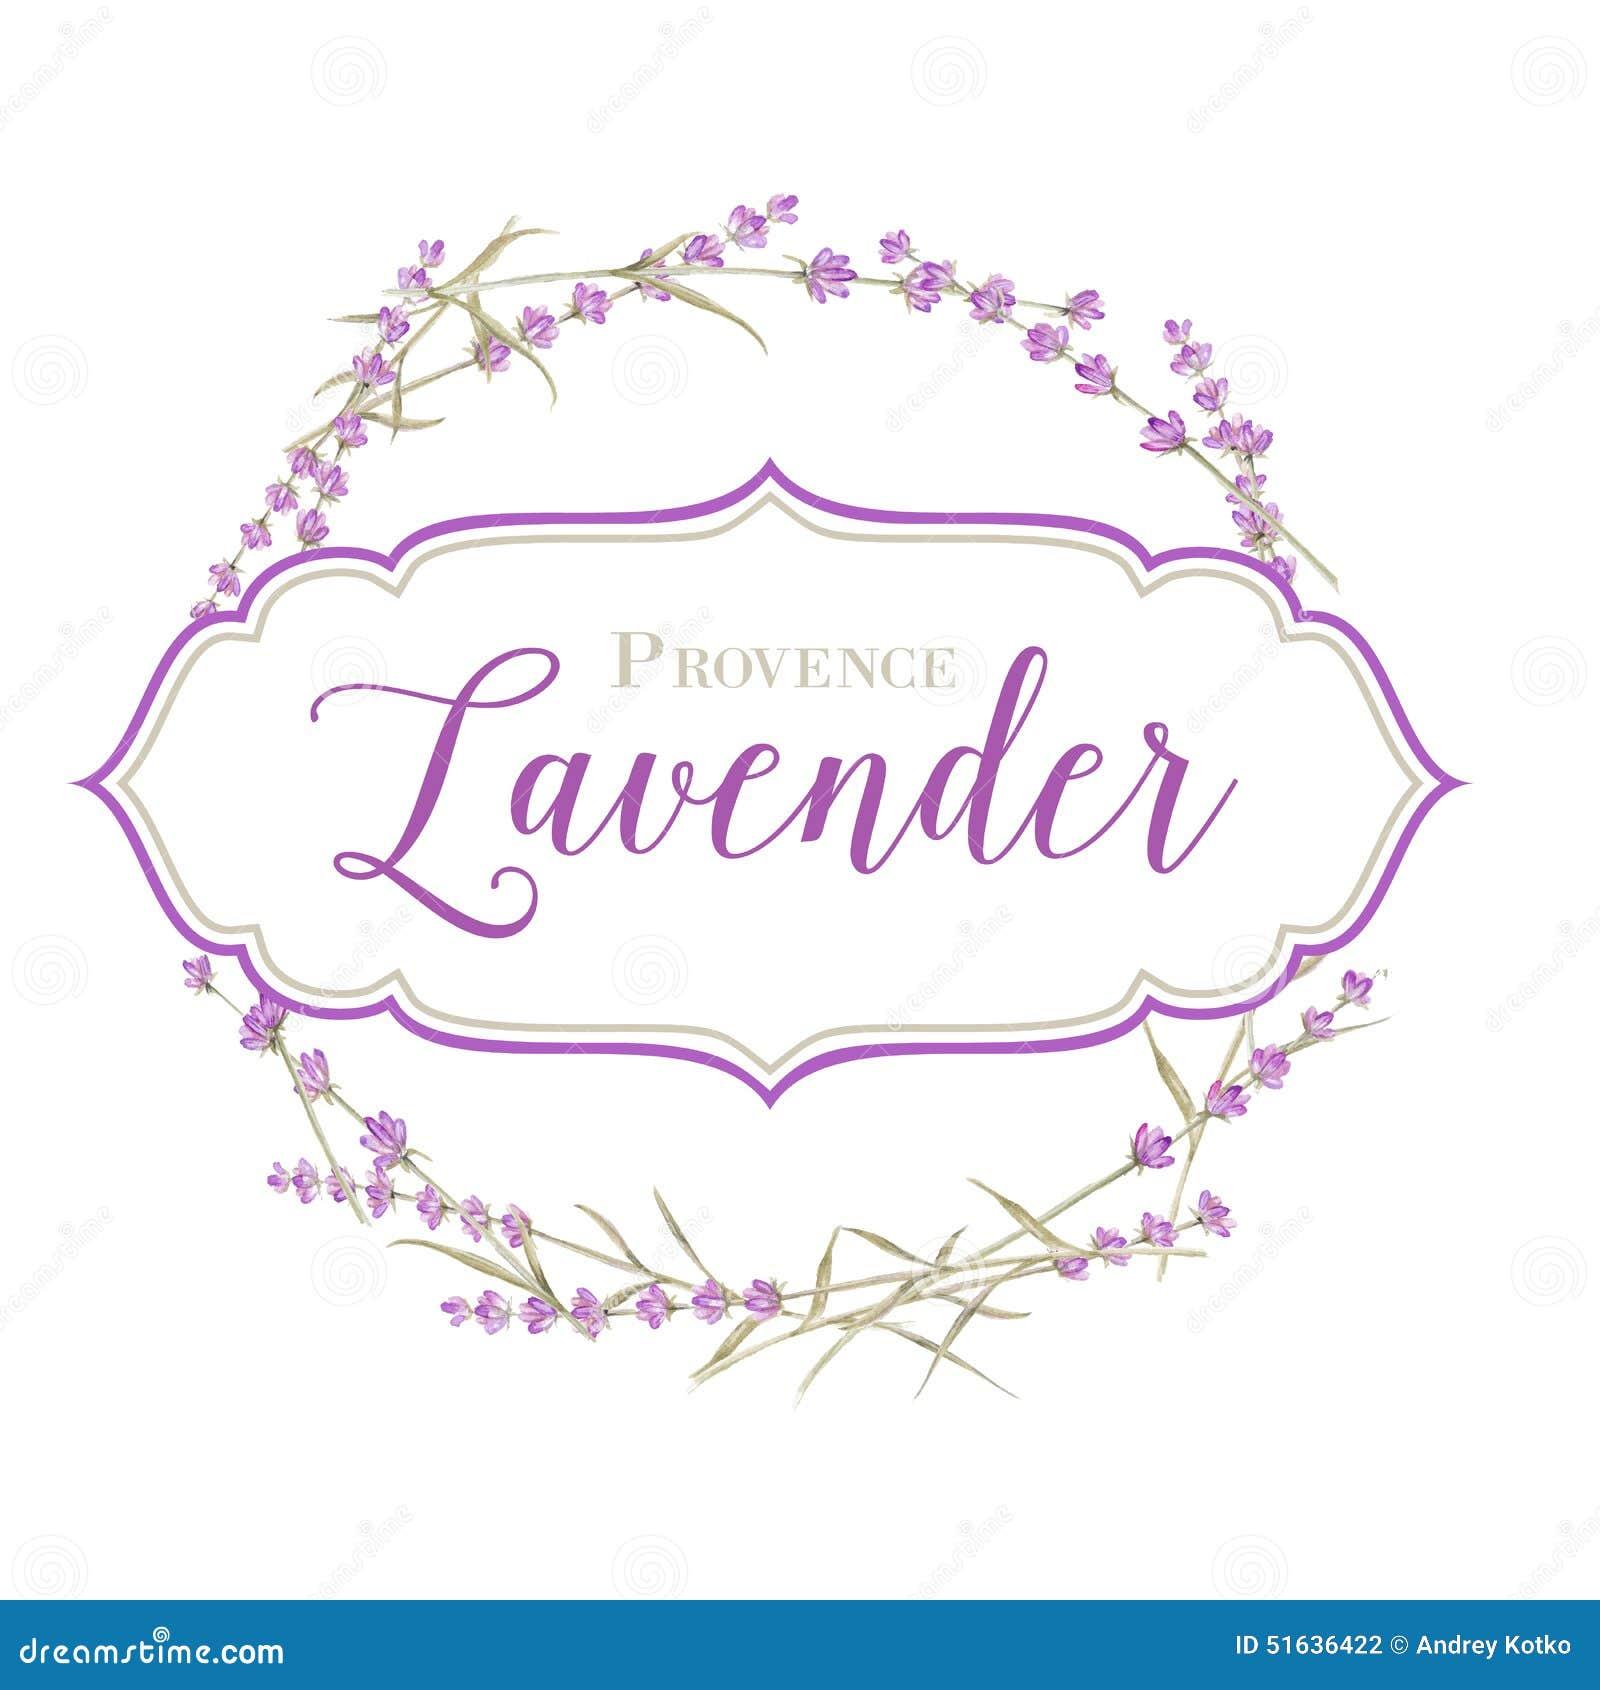 Label with lavender flowers and damask frame. Vector illustration.